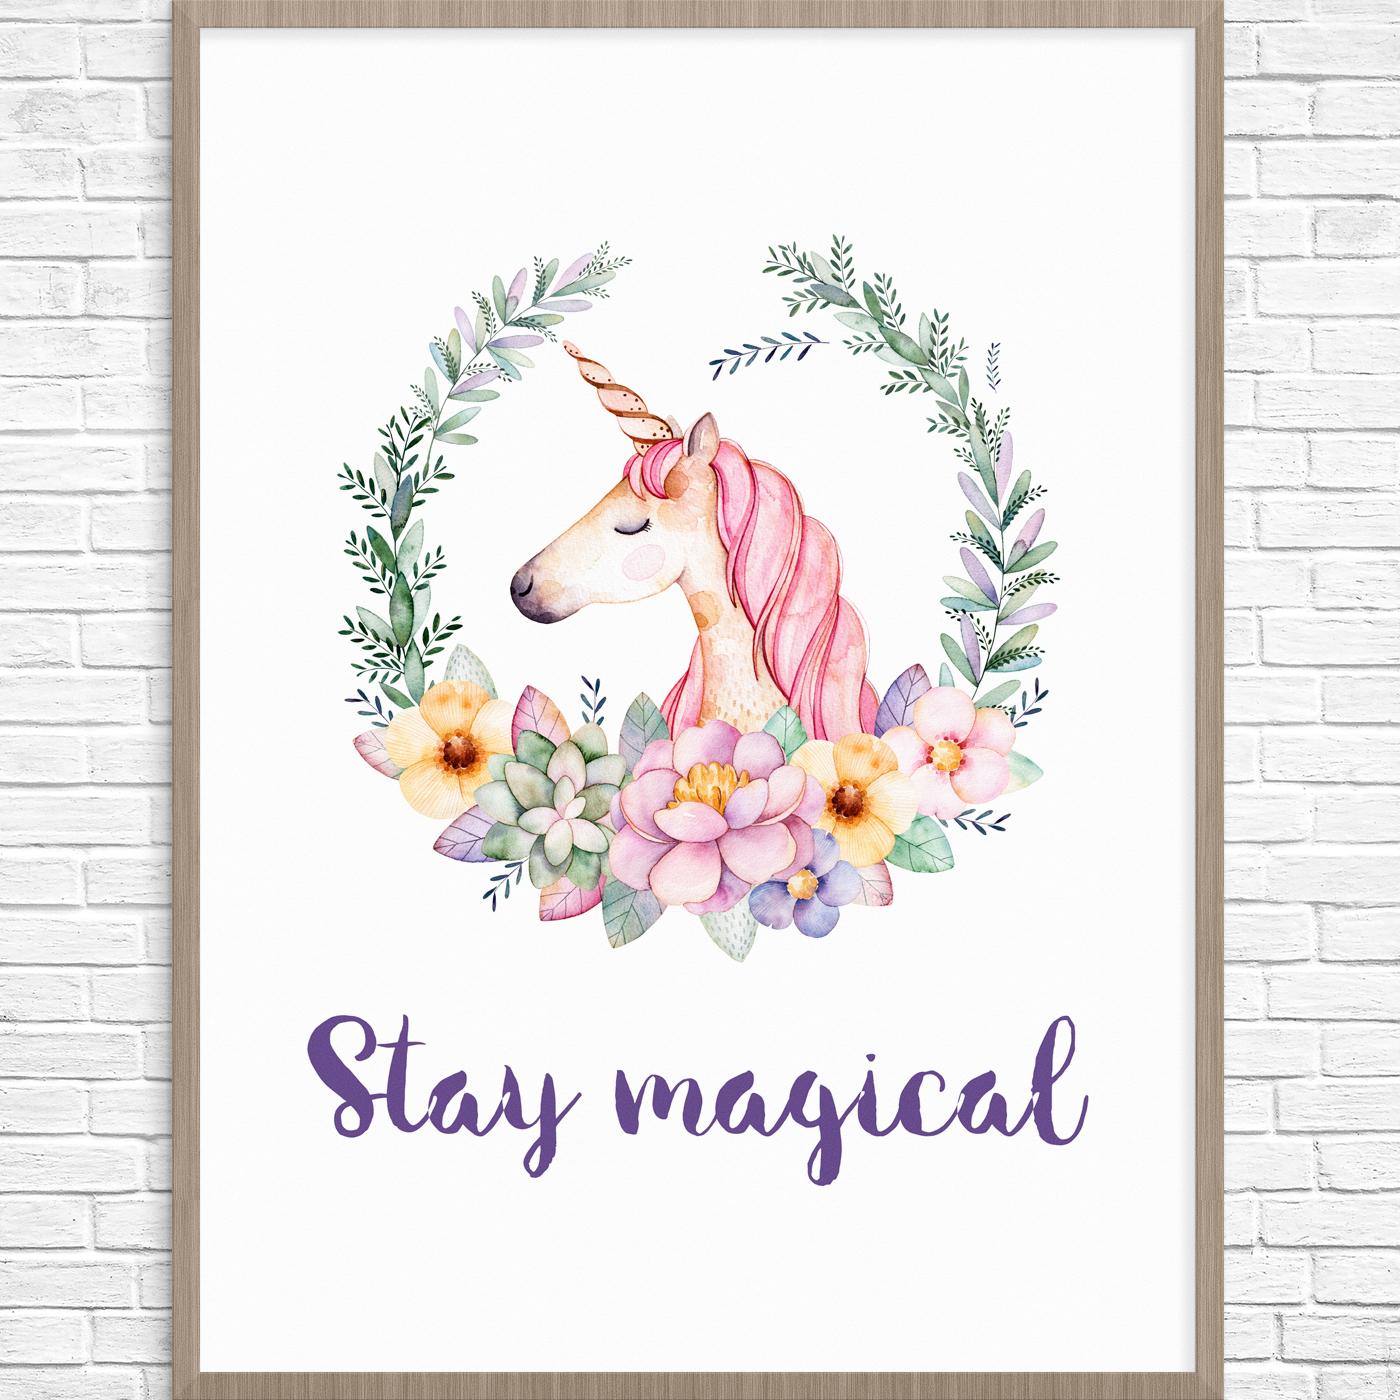 5 Beautiful Unicorn Parties And Free Printable To Make Your Party - Unicorn Printable Free